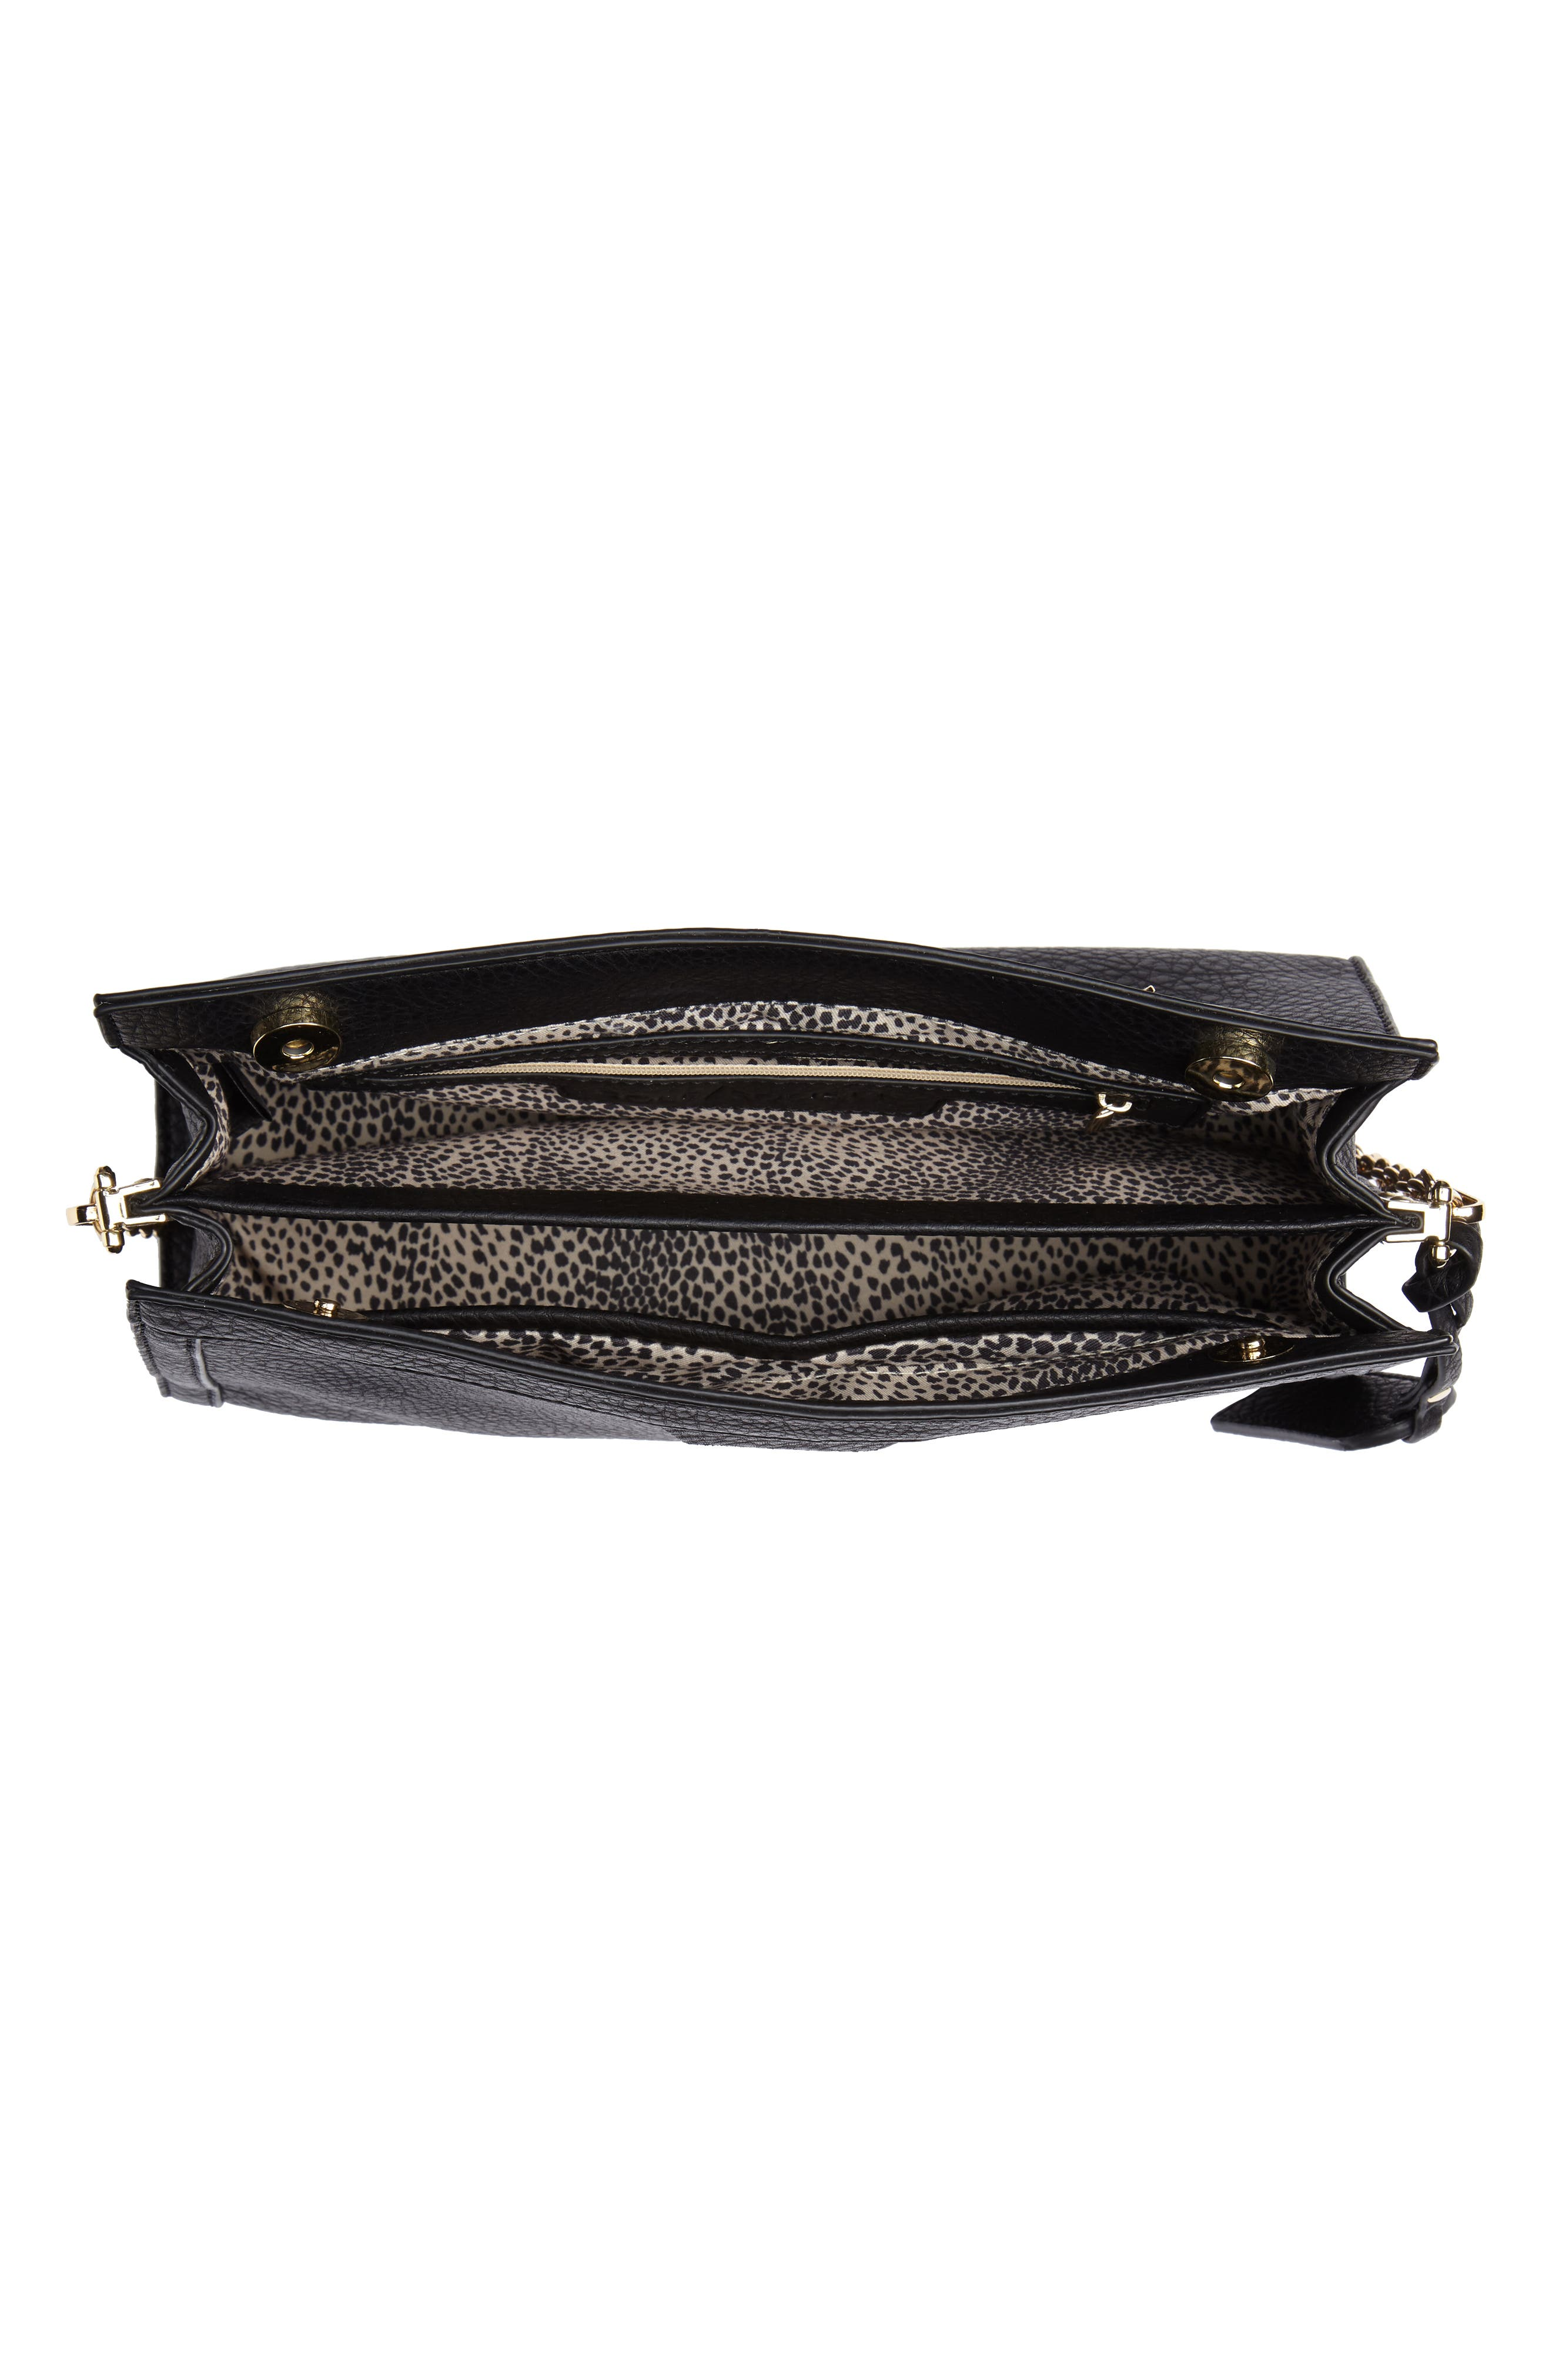 Kiato Chain Strap Crossbody Bag,                             Alternate thumbnail 4, color,                             001